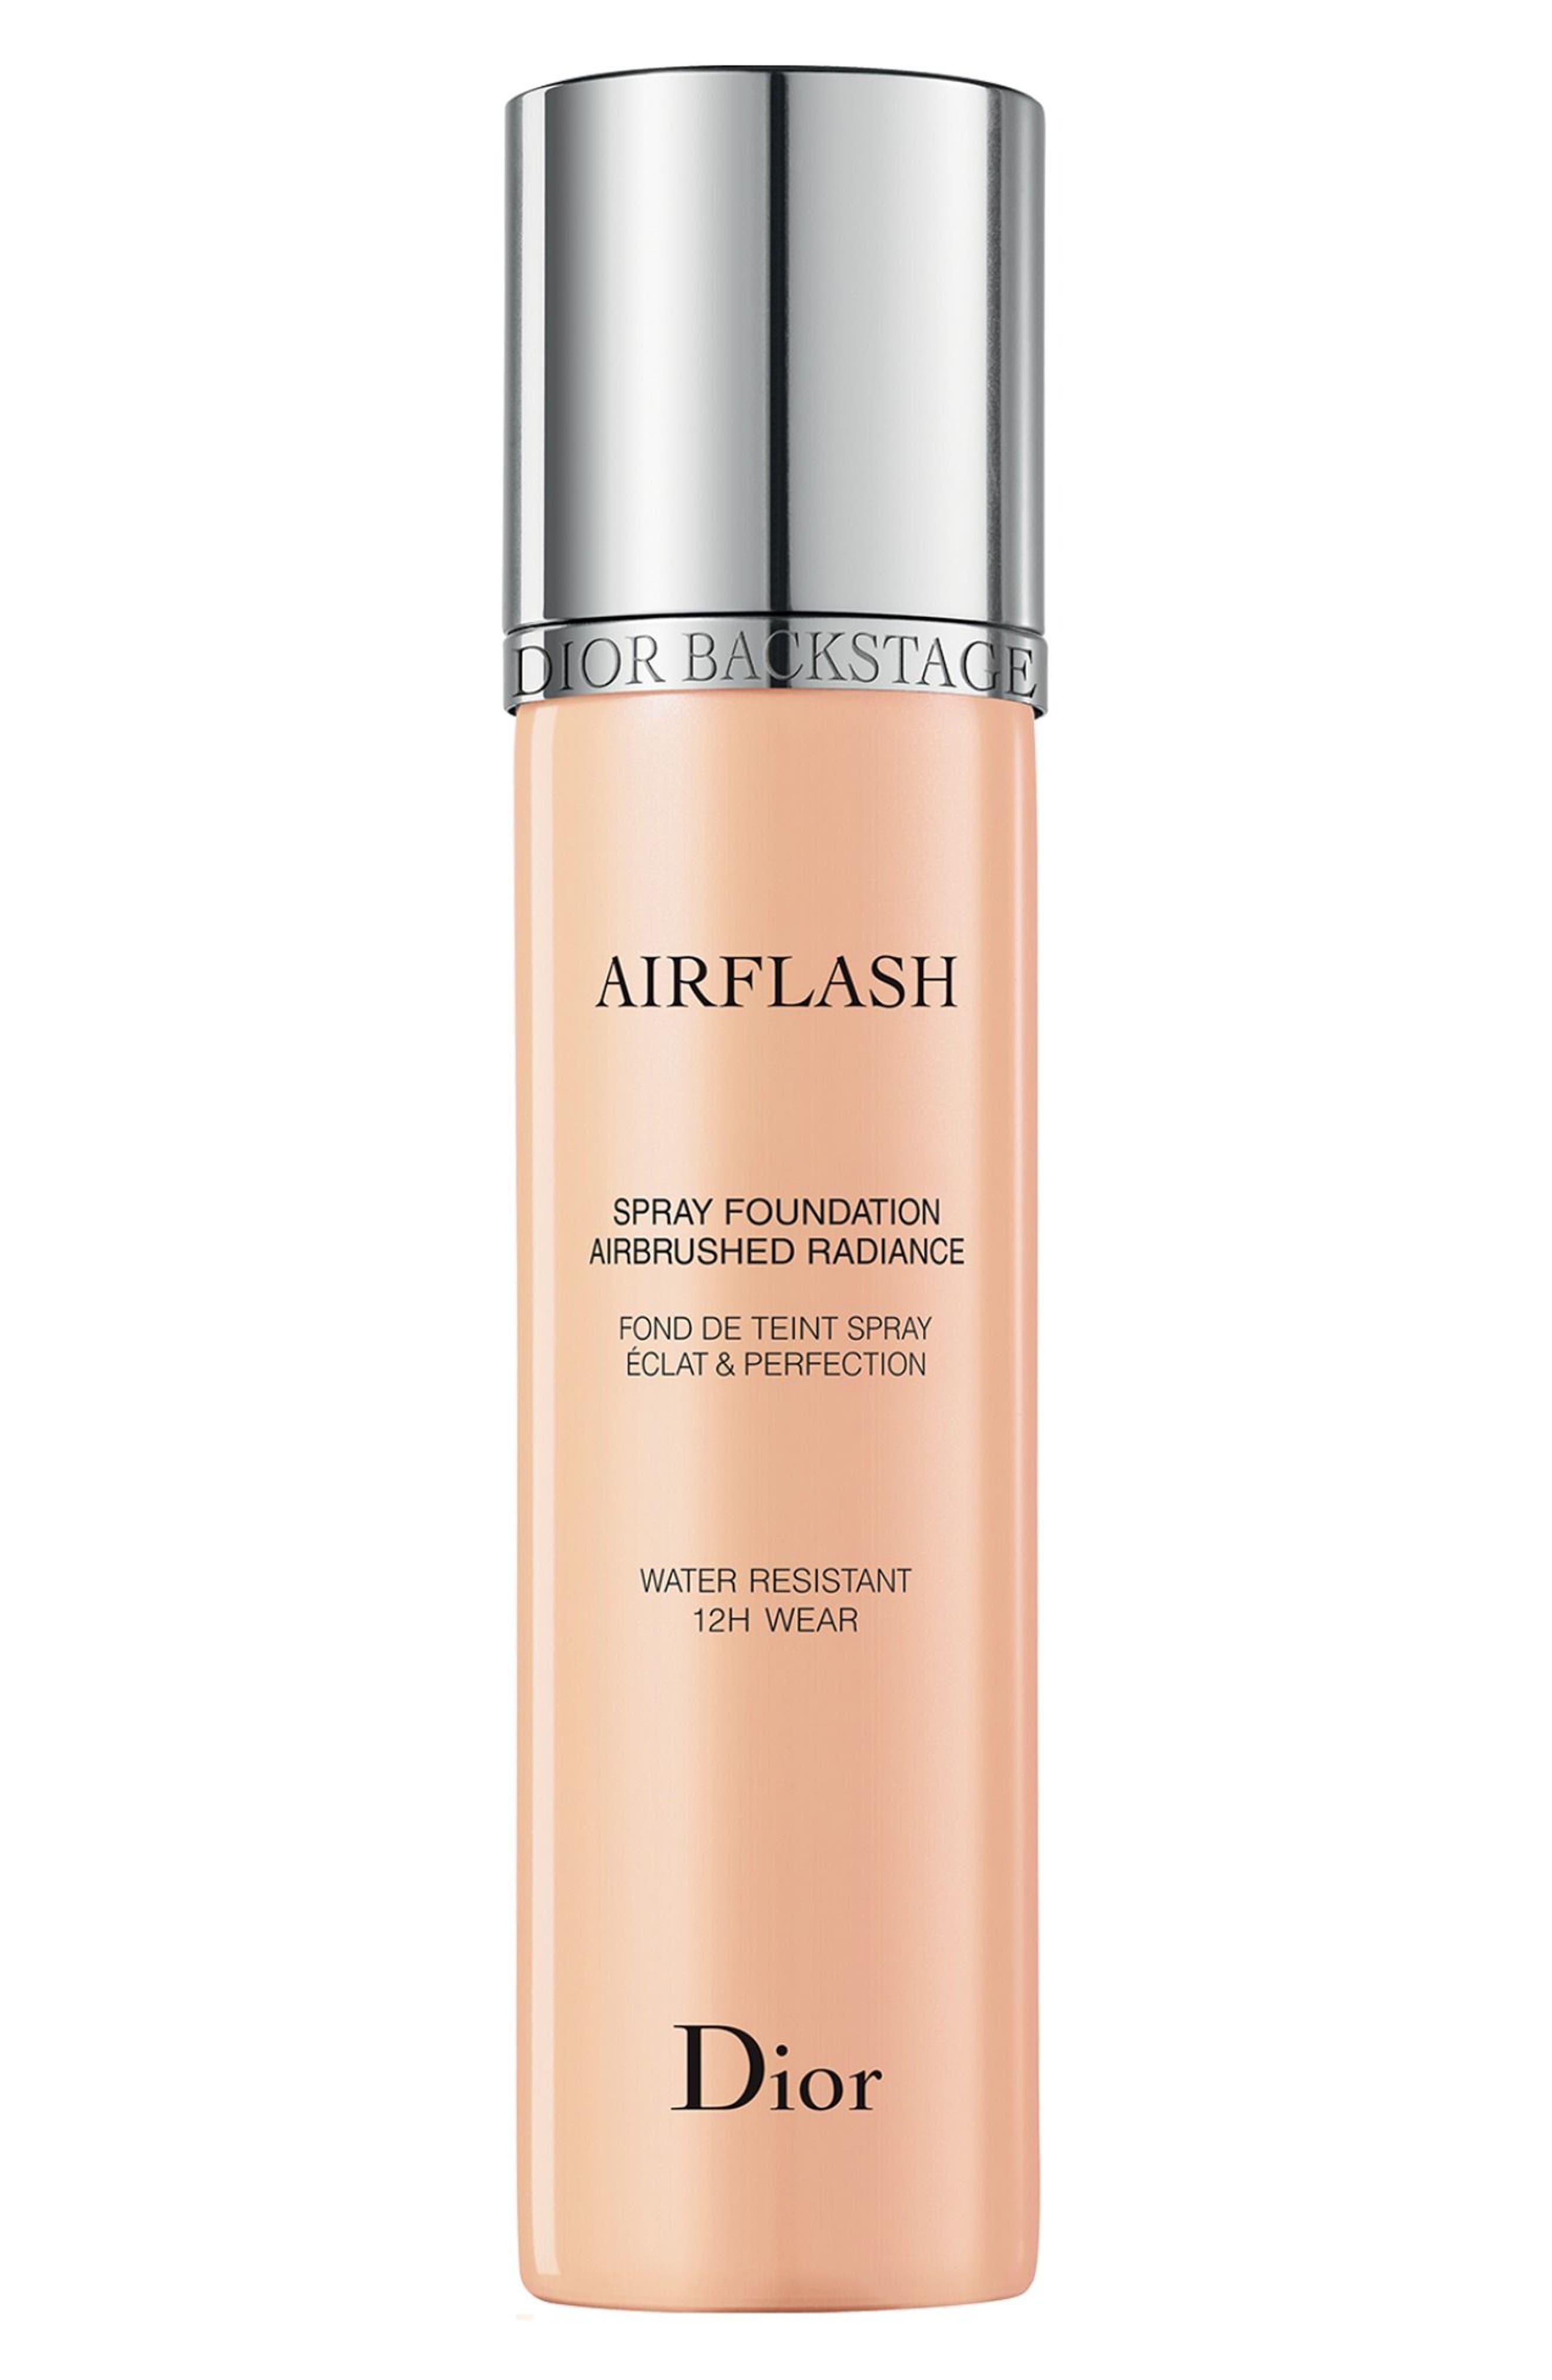 Diorskin Airflash Spray Foundation,                             Main thumbnail 1, color,                             202 Cameo